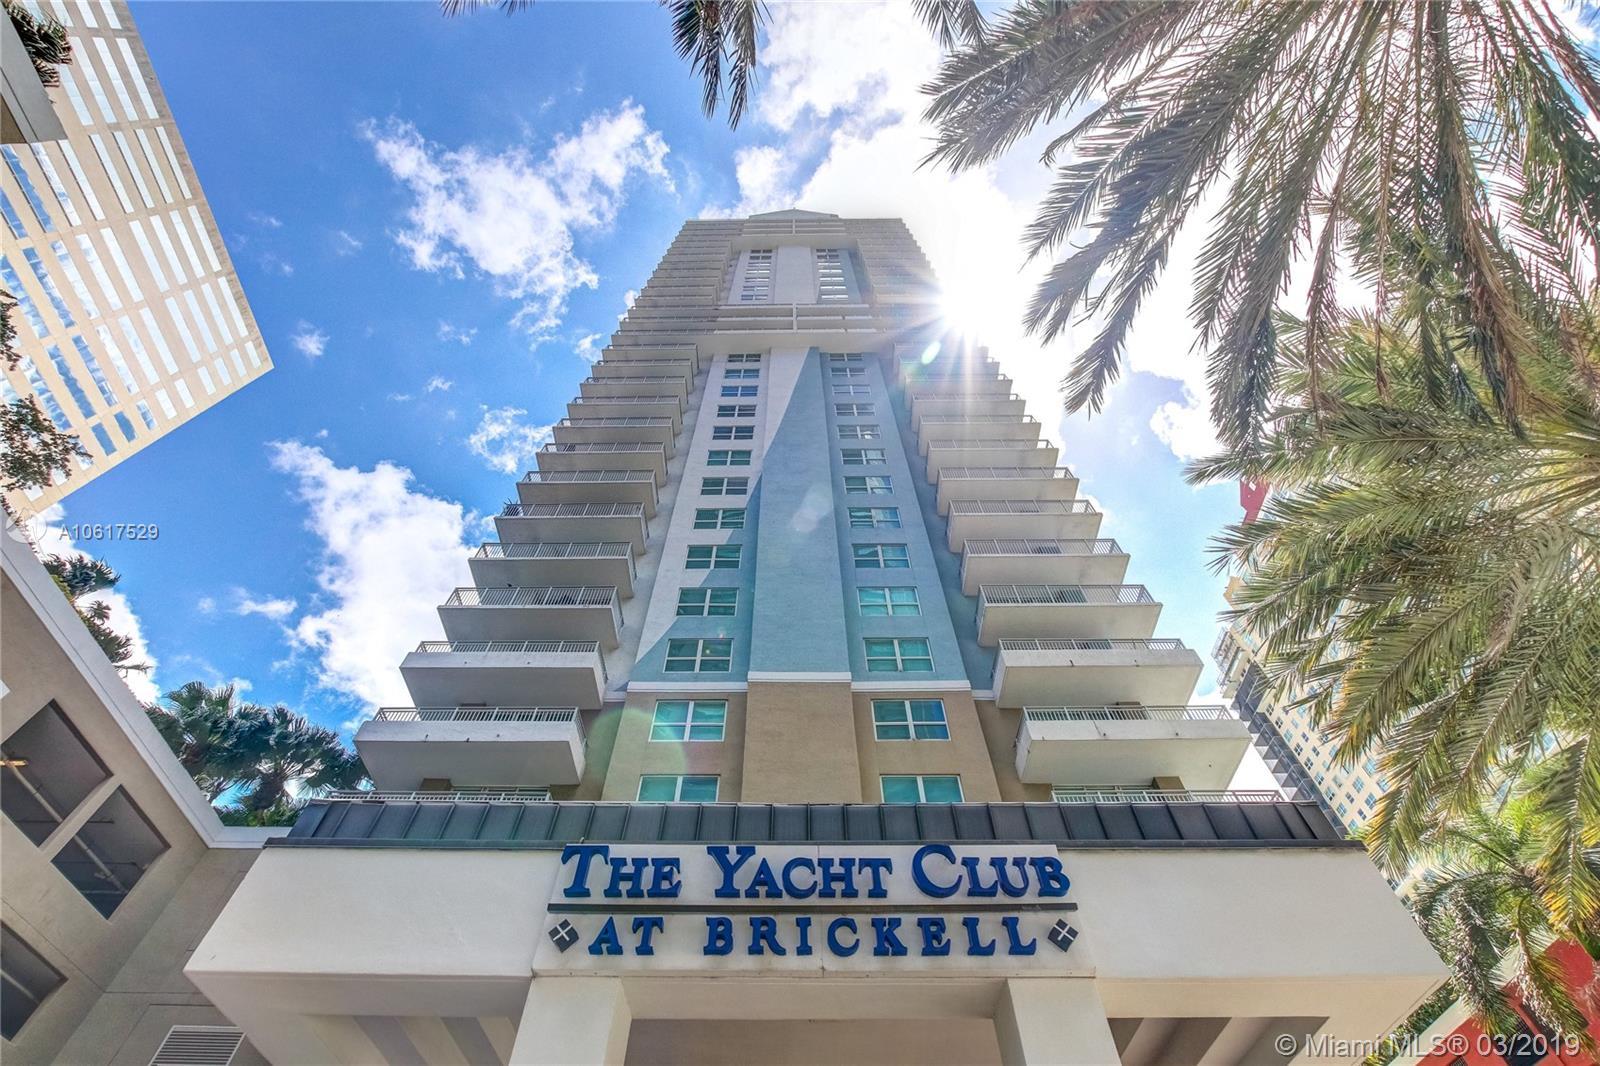 1111 Brickell Bay Dr, Miami, FL 33131, 1111 Brickell #2406, Brickell, Miami A10617529 image #24